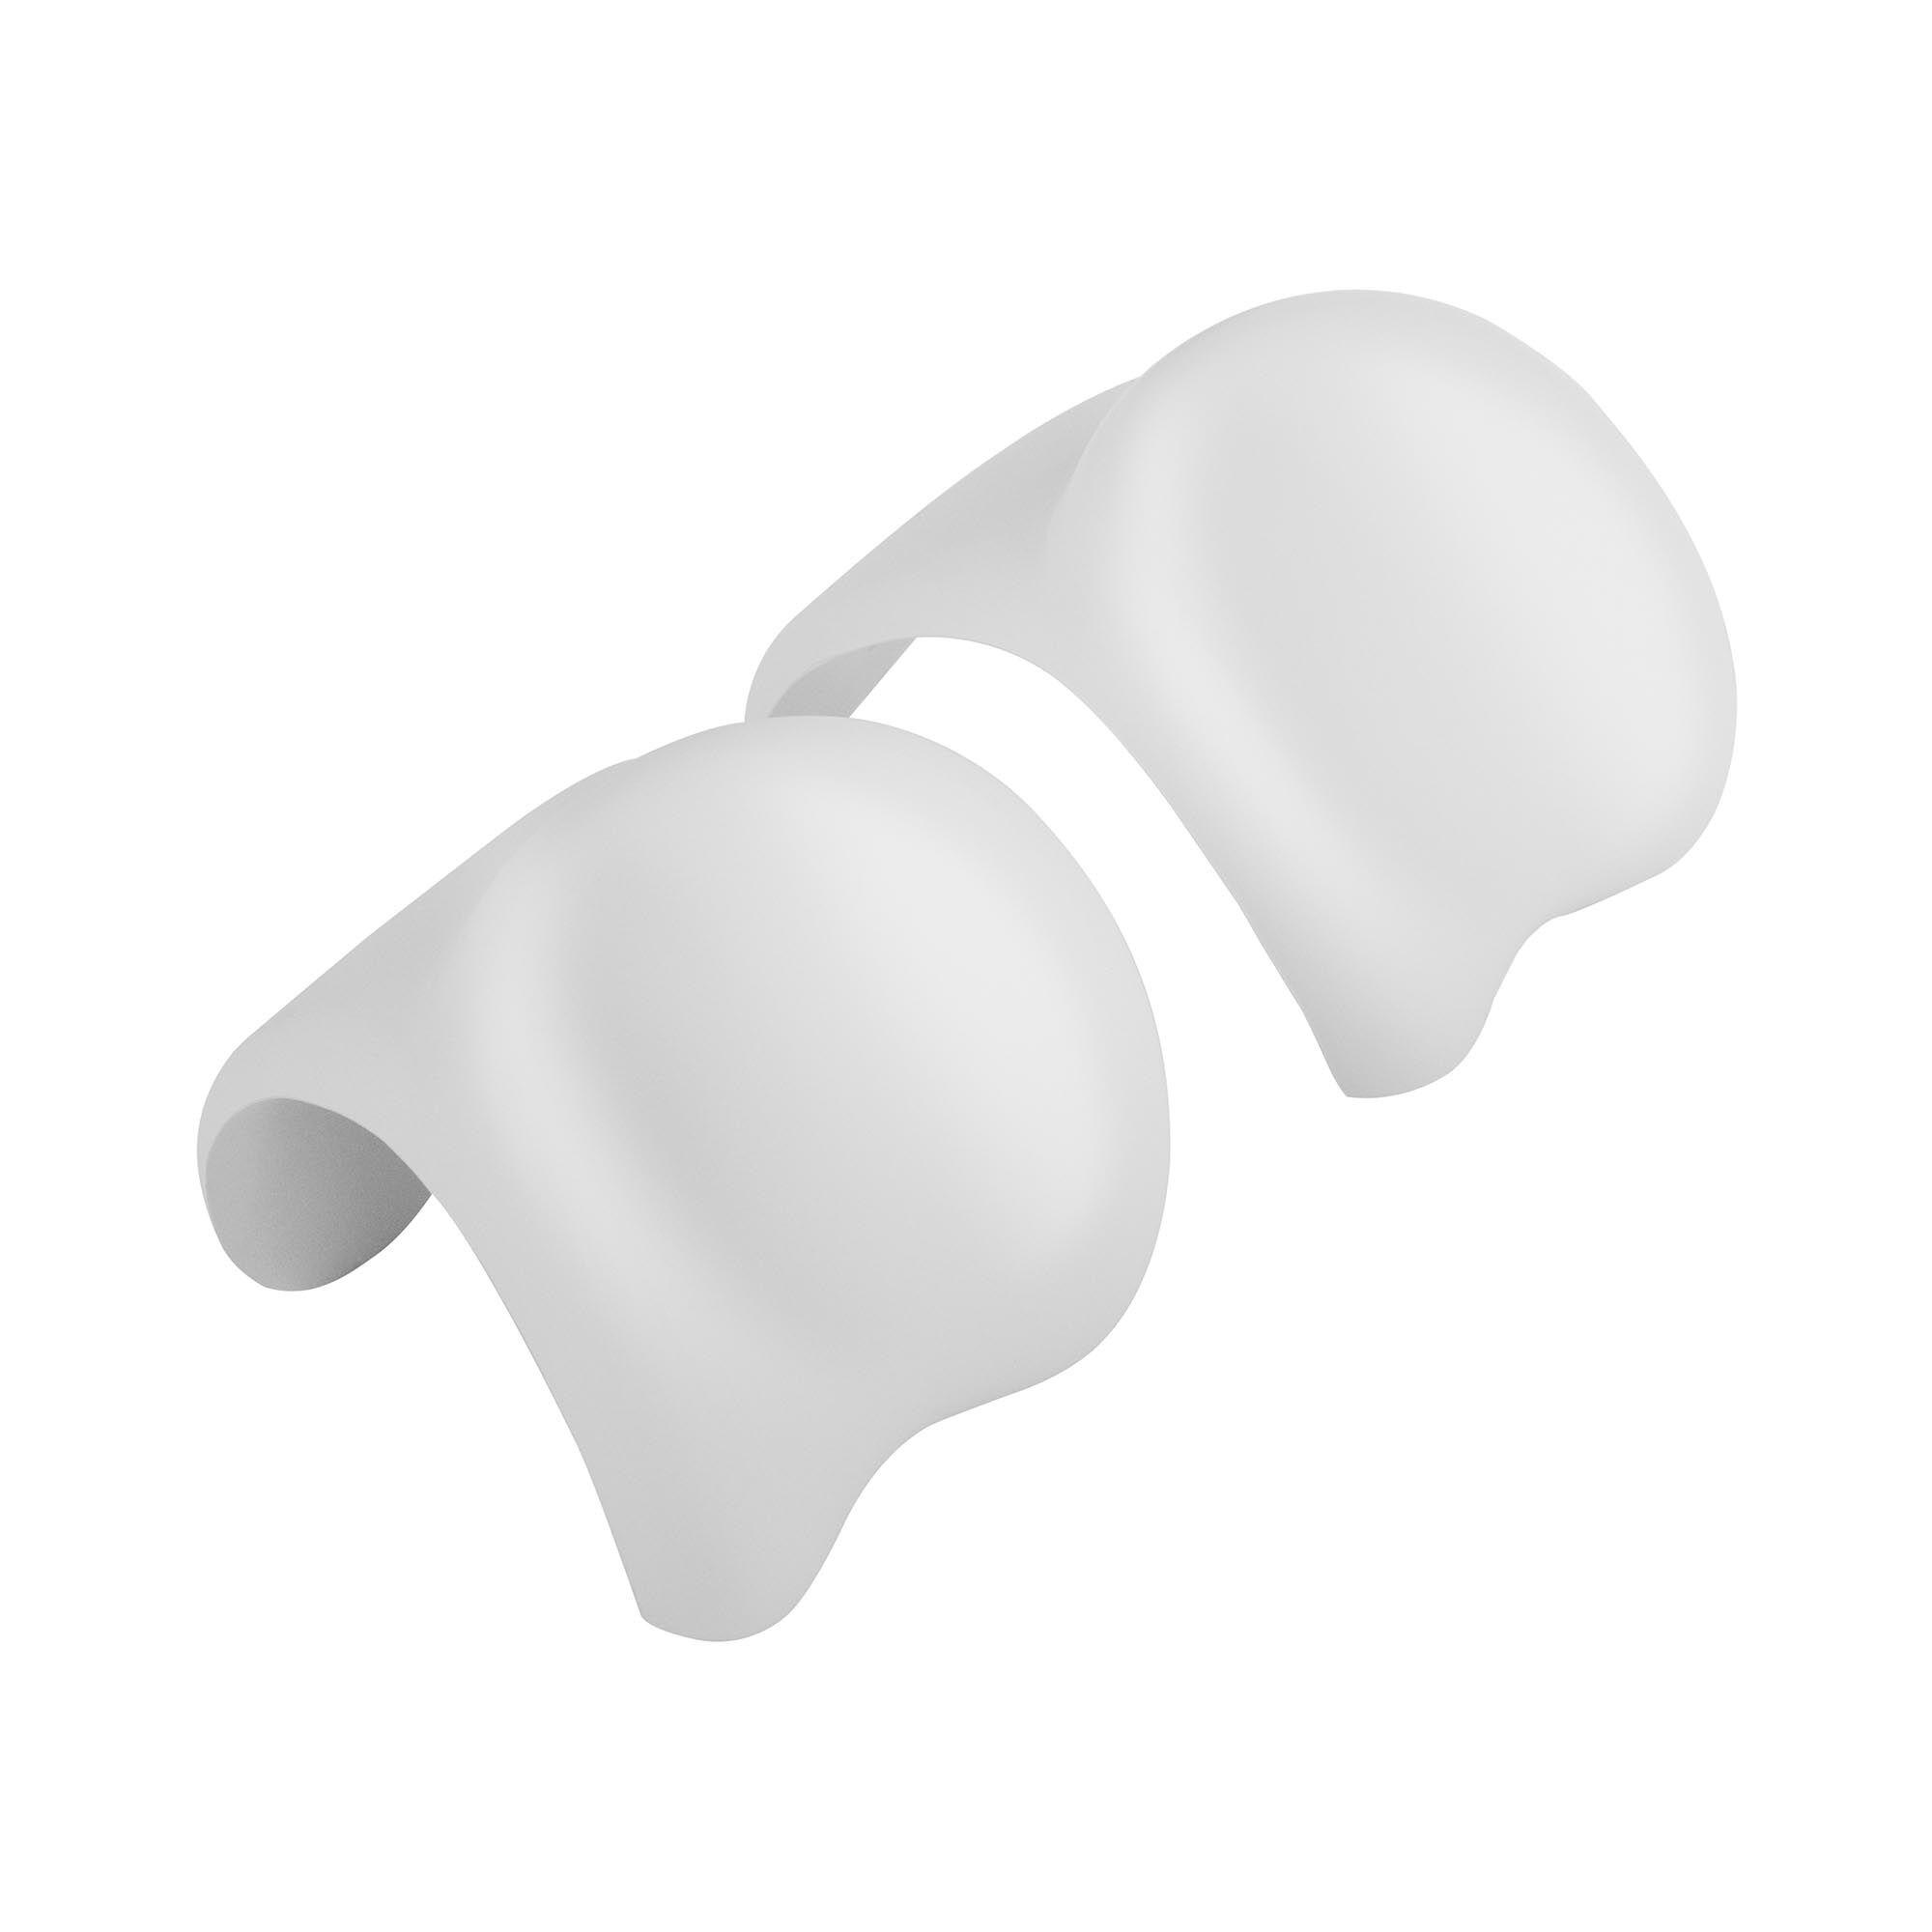 Uniprodo Poggiatesta vasca idromassaggio - 2 pezzi UNI_POOLS_04